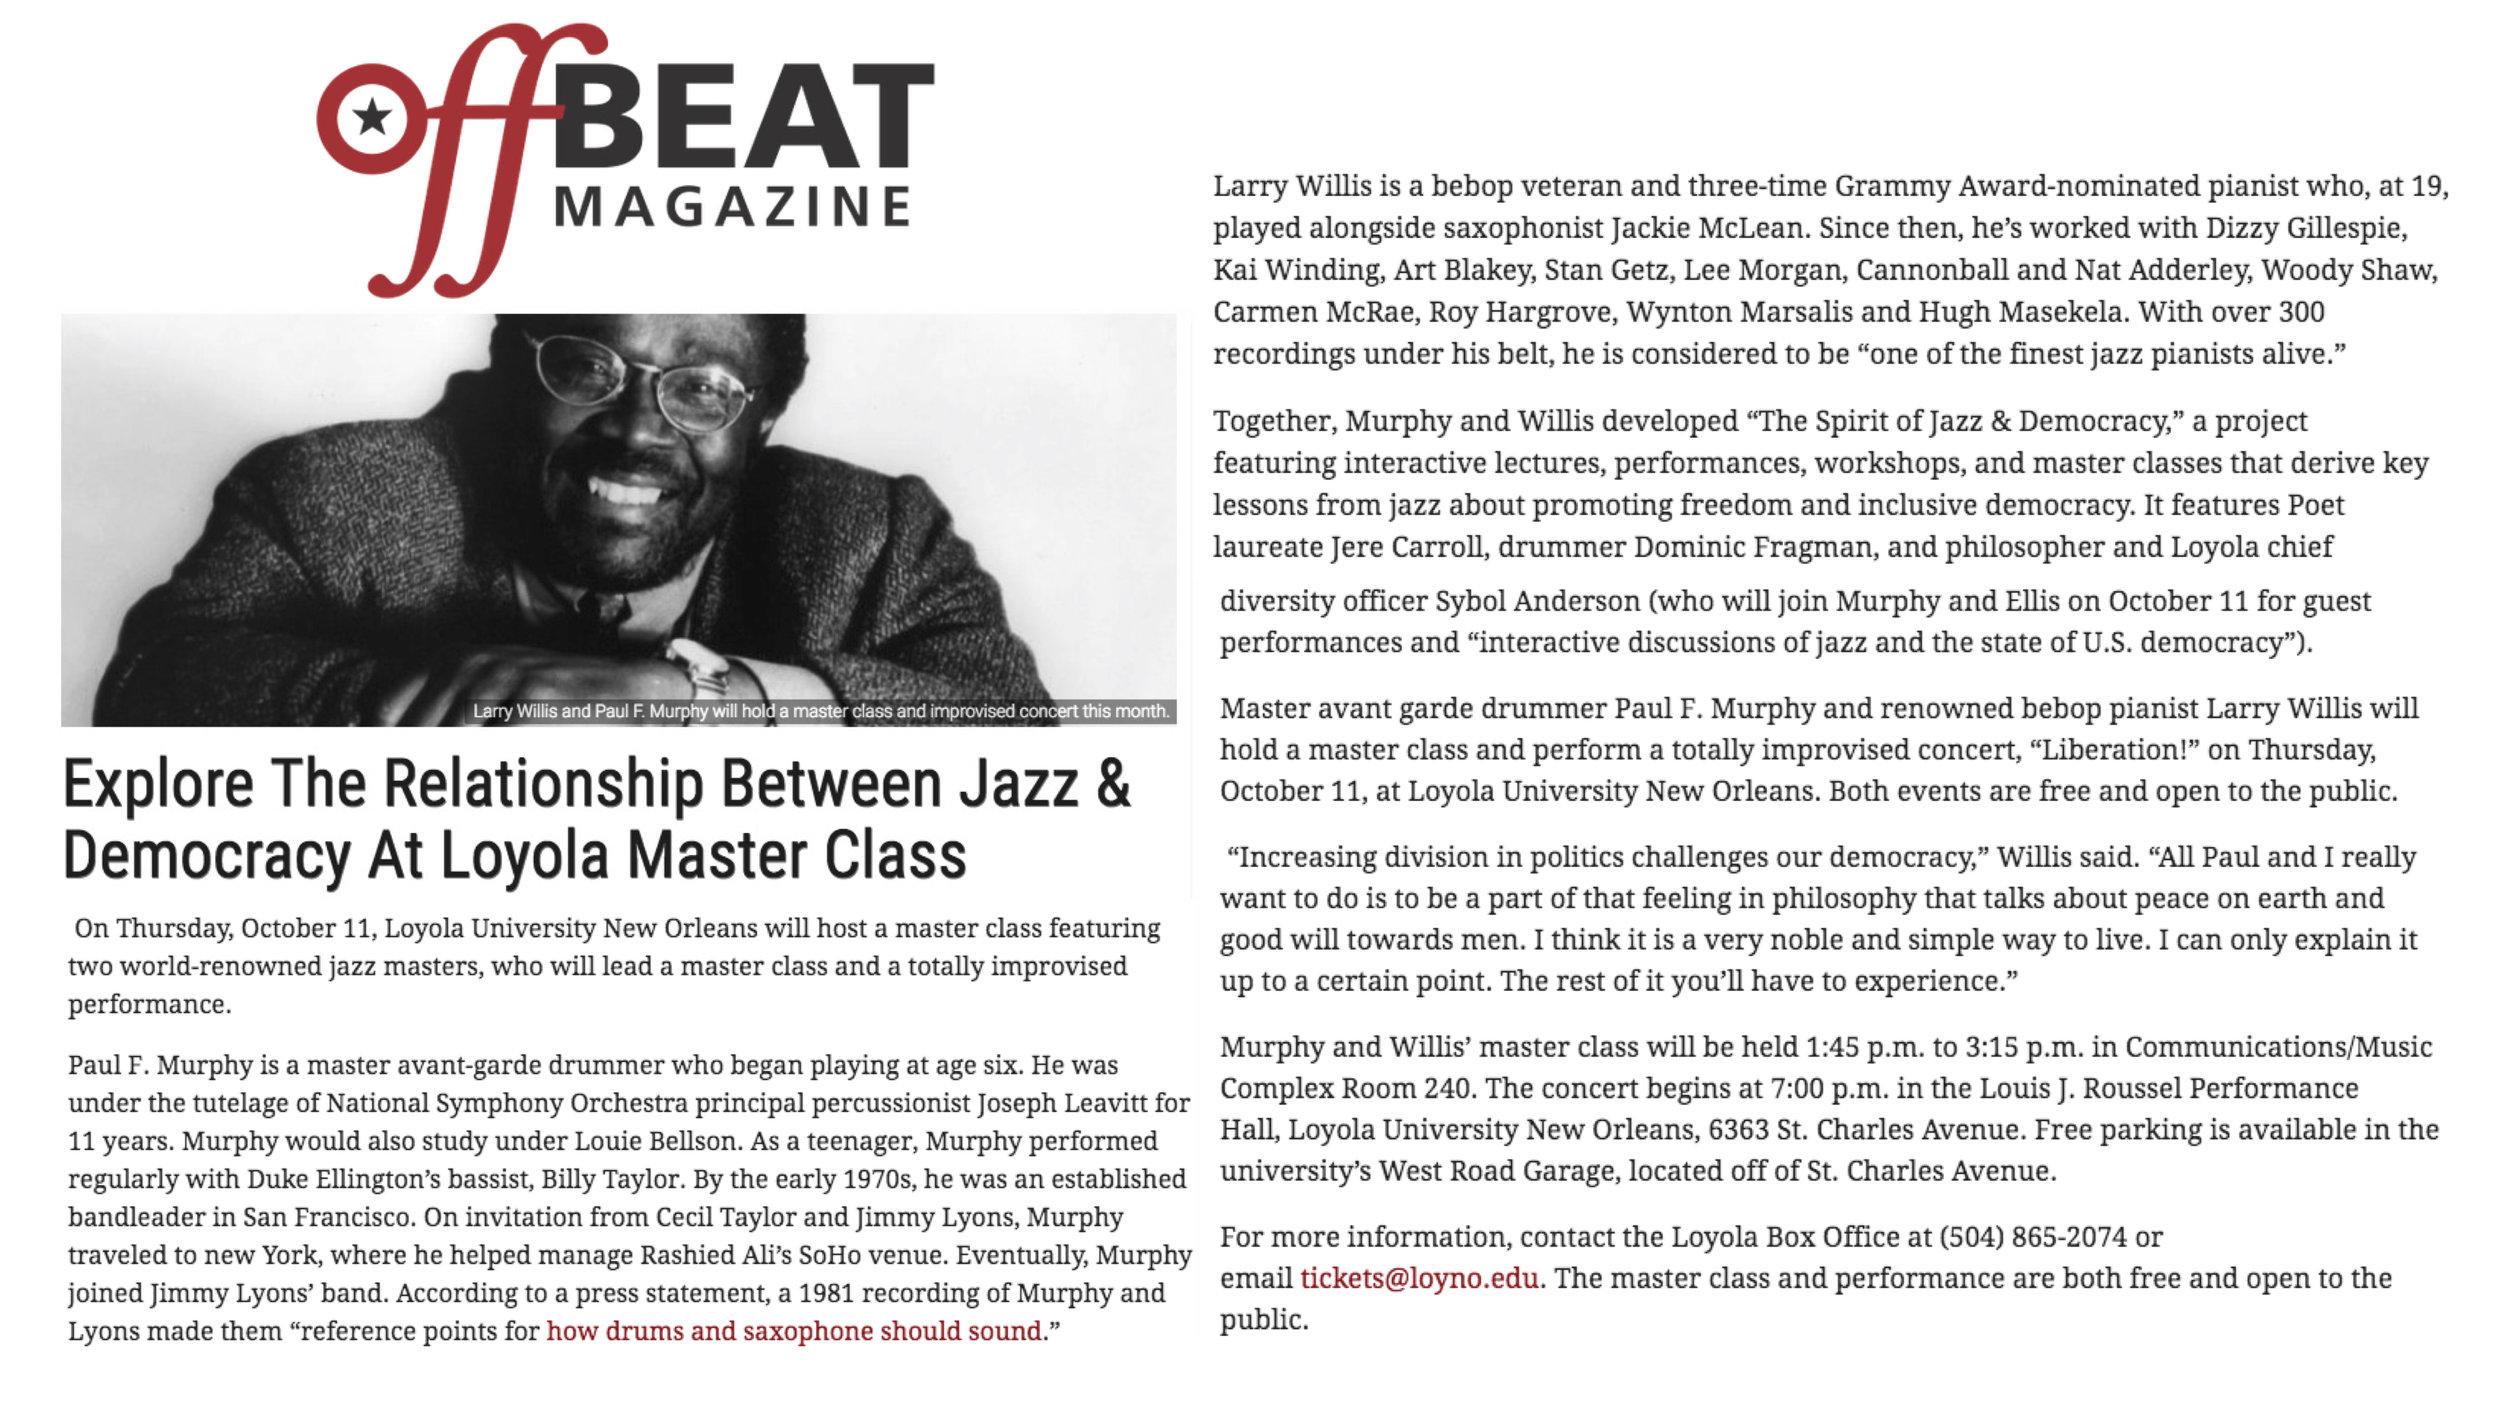 Spirit of Jazz & Democracy Offbeat Magazine